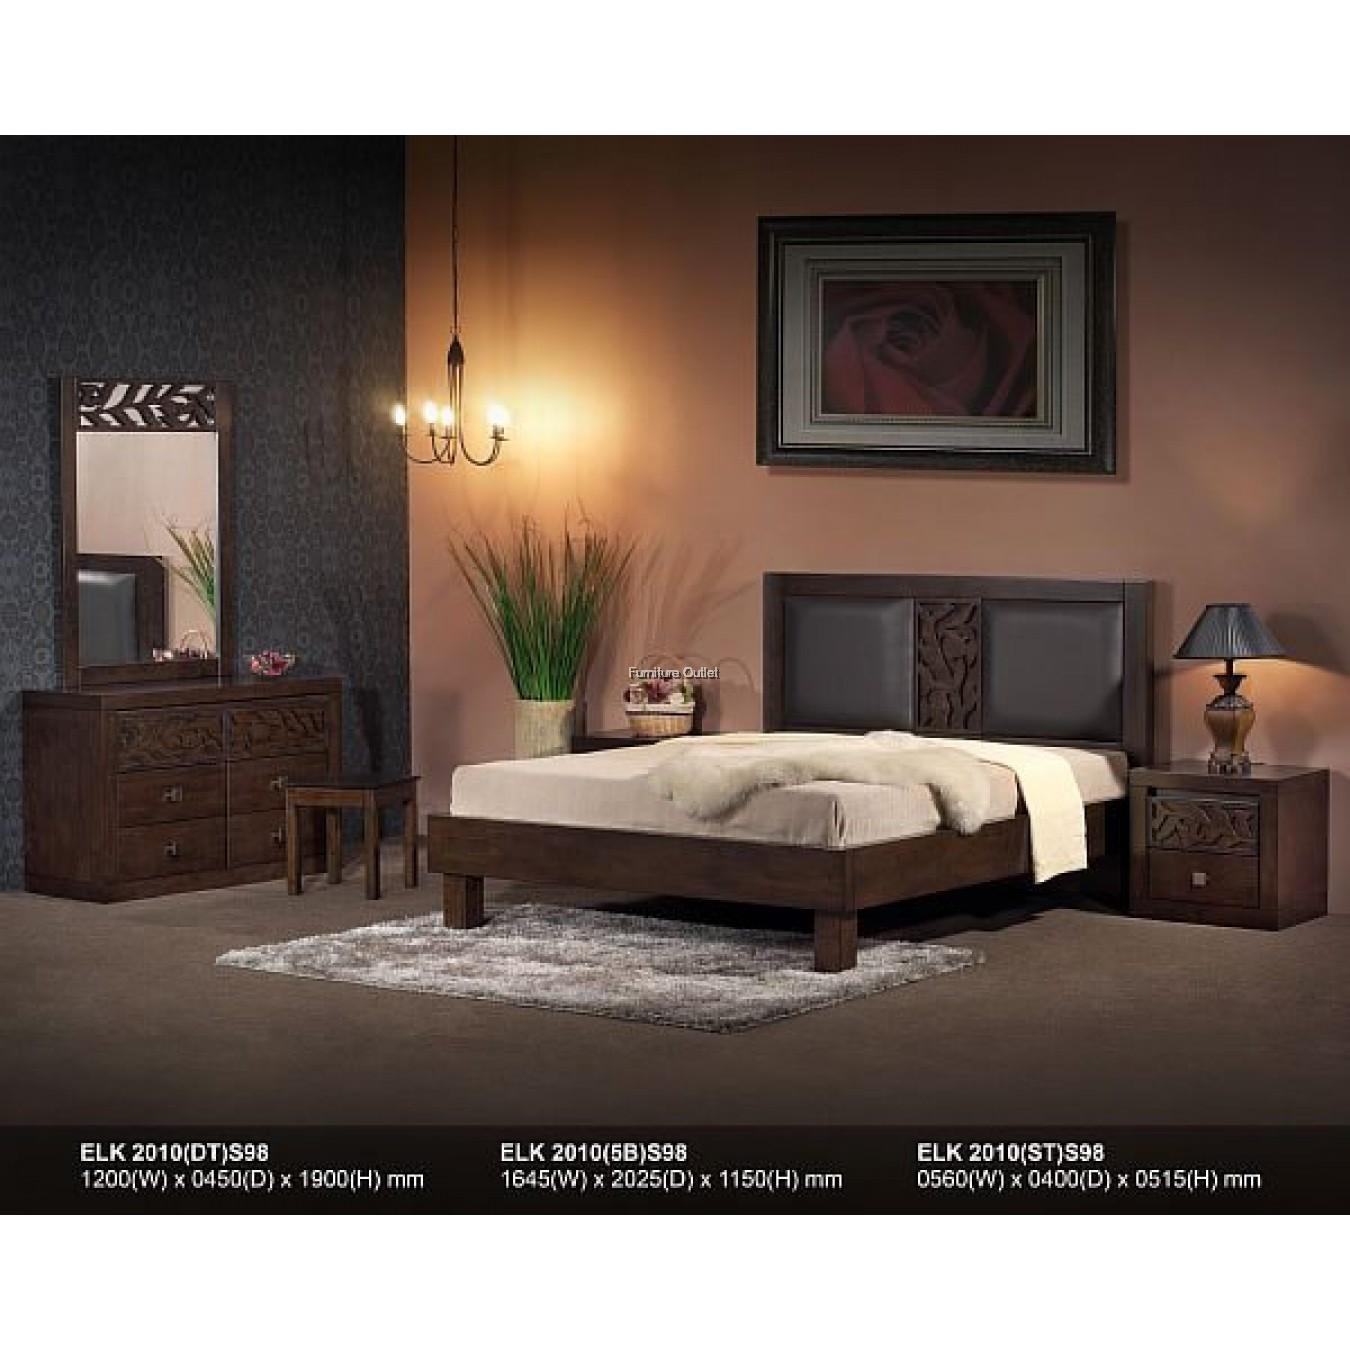 FULL SOLID WOOD BEDROOM SET - 6